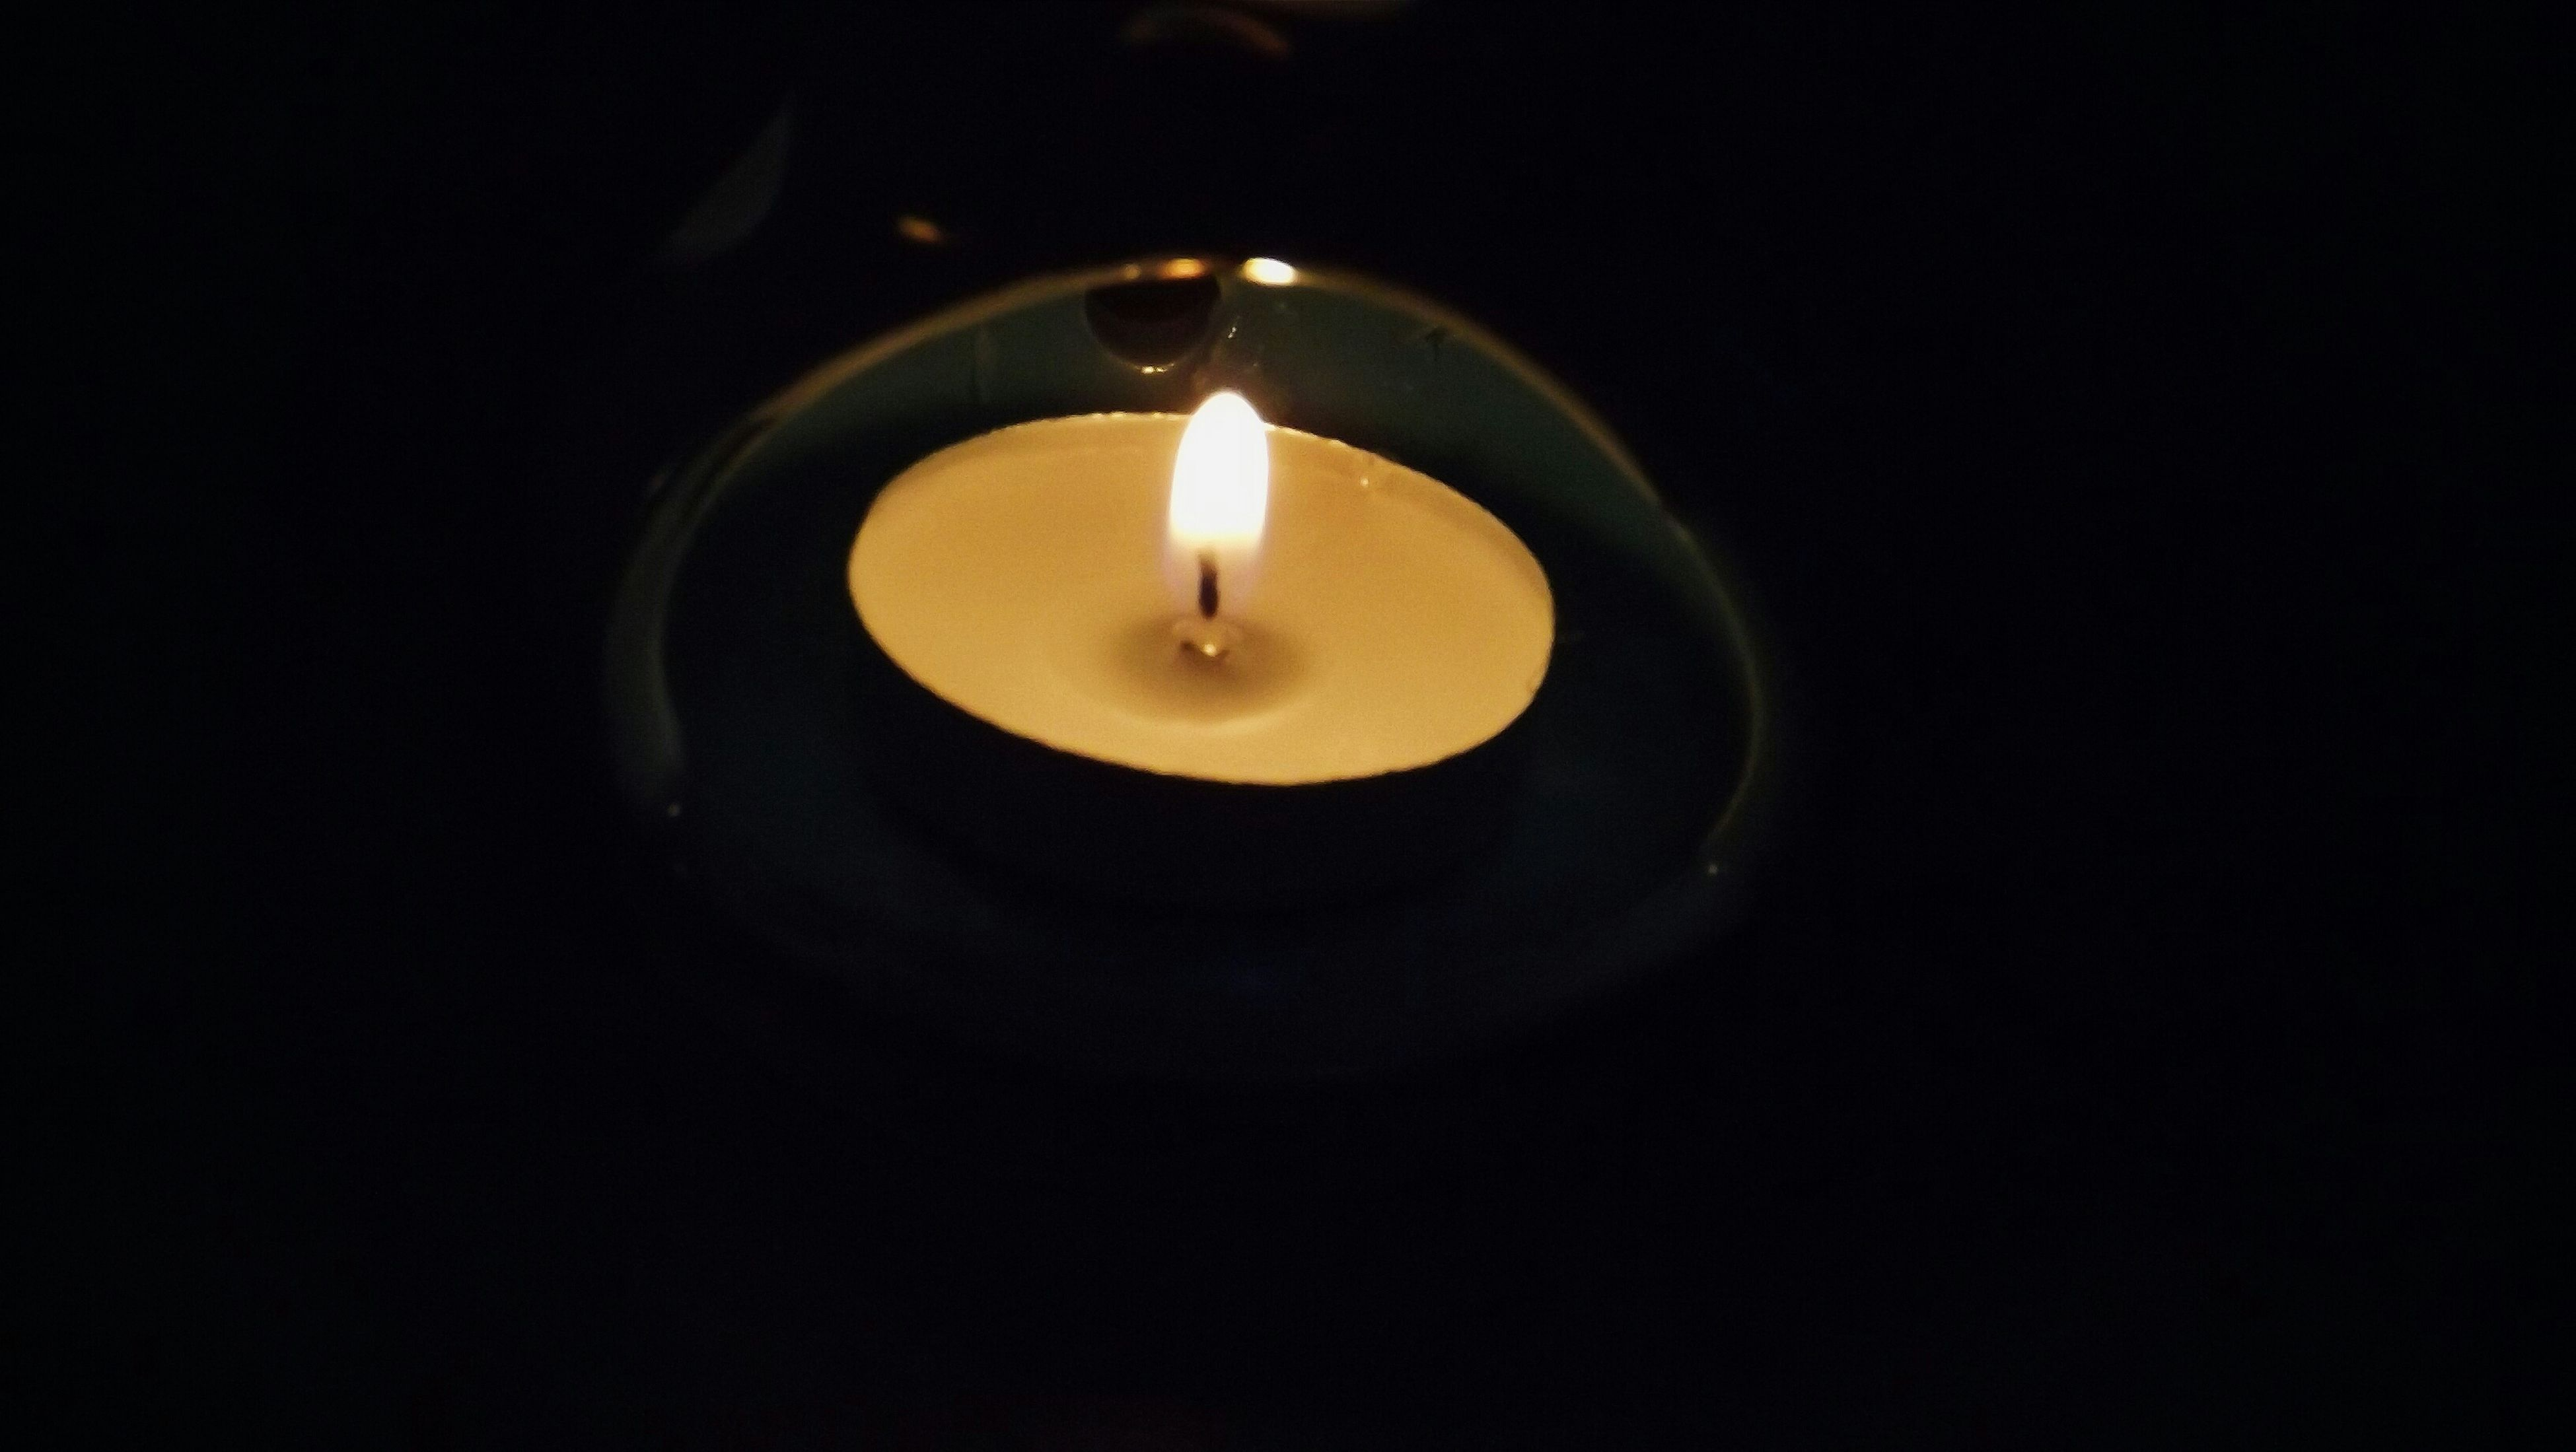 illuminated, lighting equipment, glowing, dark, night, electricity, lit, indoors, copy space, black background, darkroom, studio shot, flame, burning, light - natural phenomenon, electric lamp, light bulb, close-up, lamp, candle